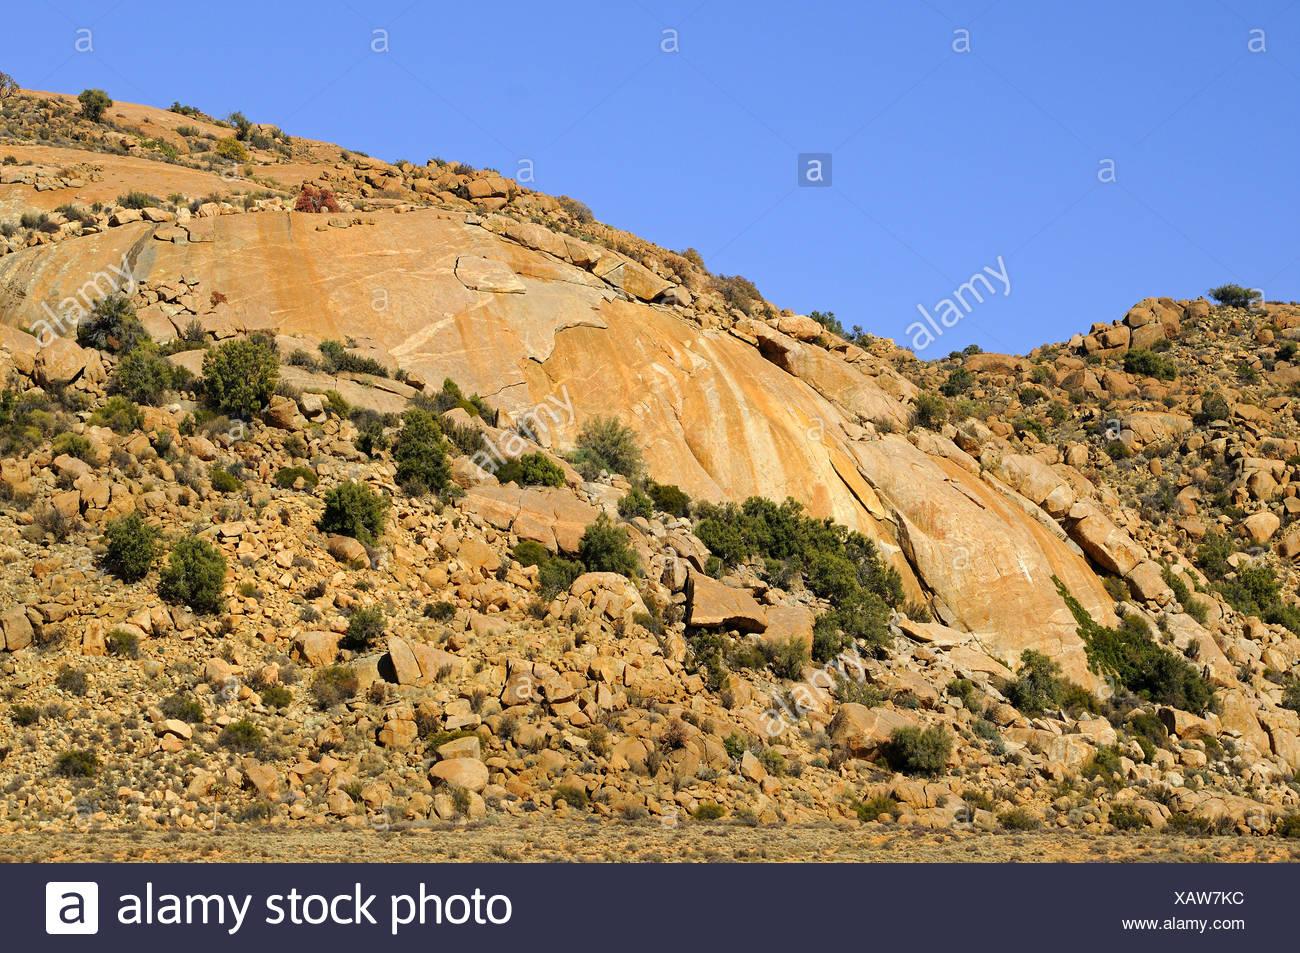 monolithic Granite dome, Goegap, South Africa Stock Photo